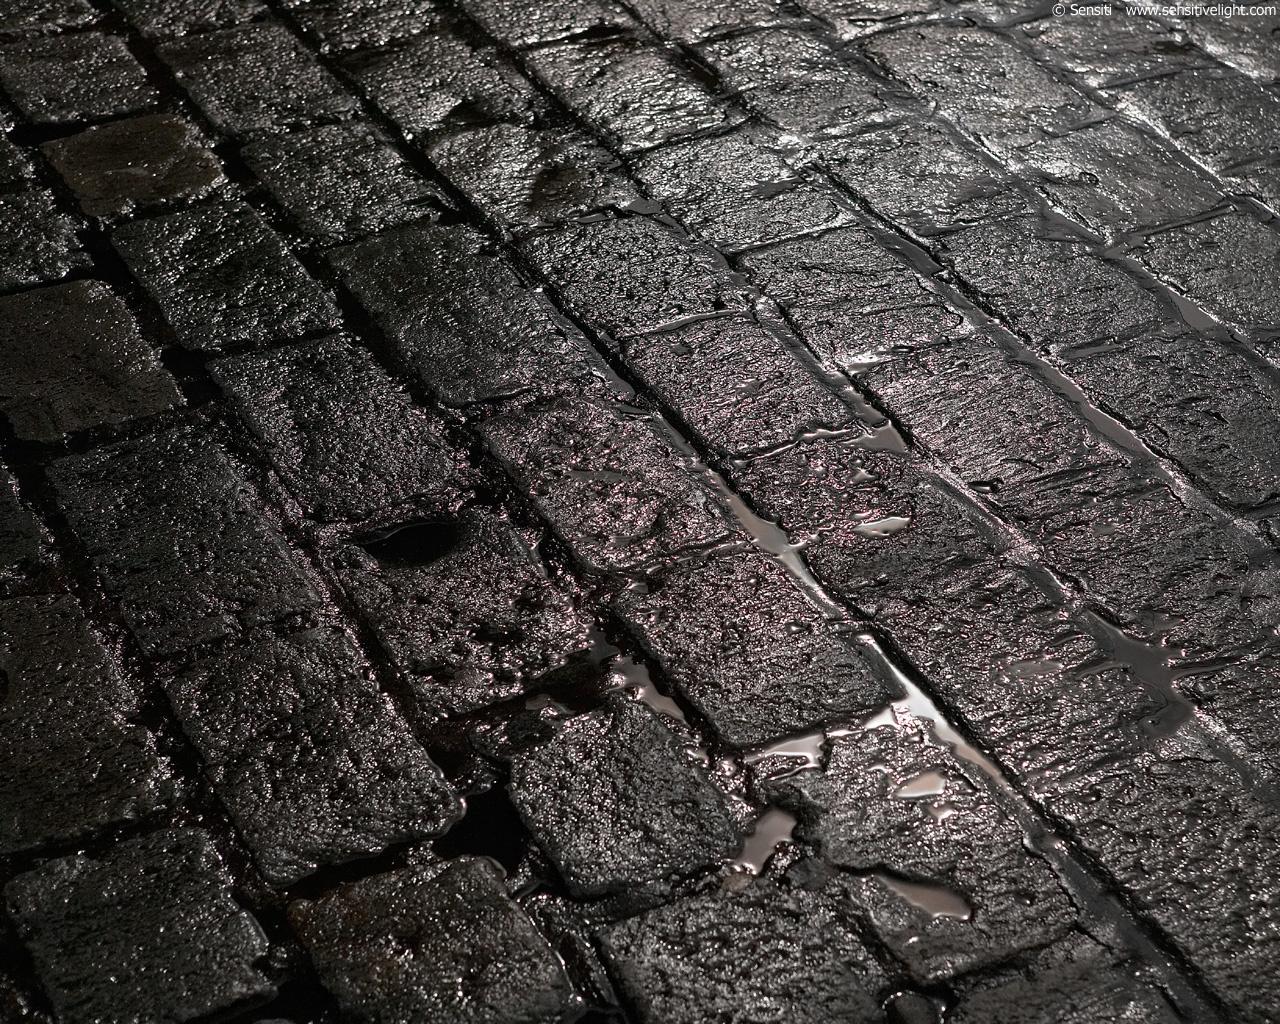 Wet stone street wallpapers Wet stone street stock photos 1280x1024